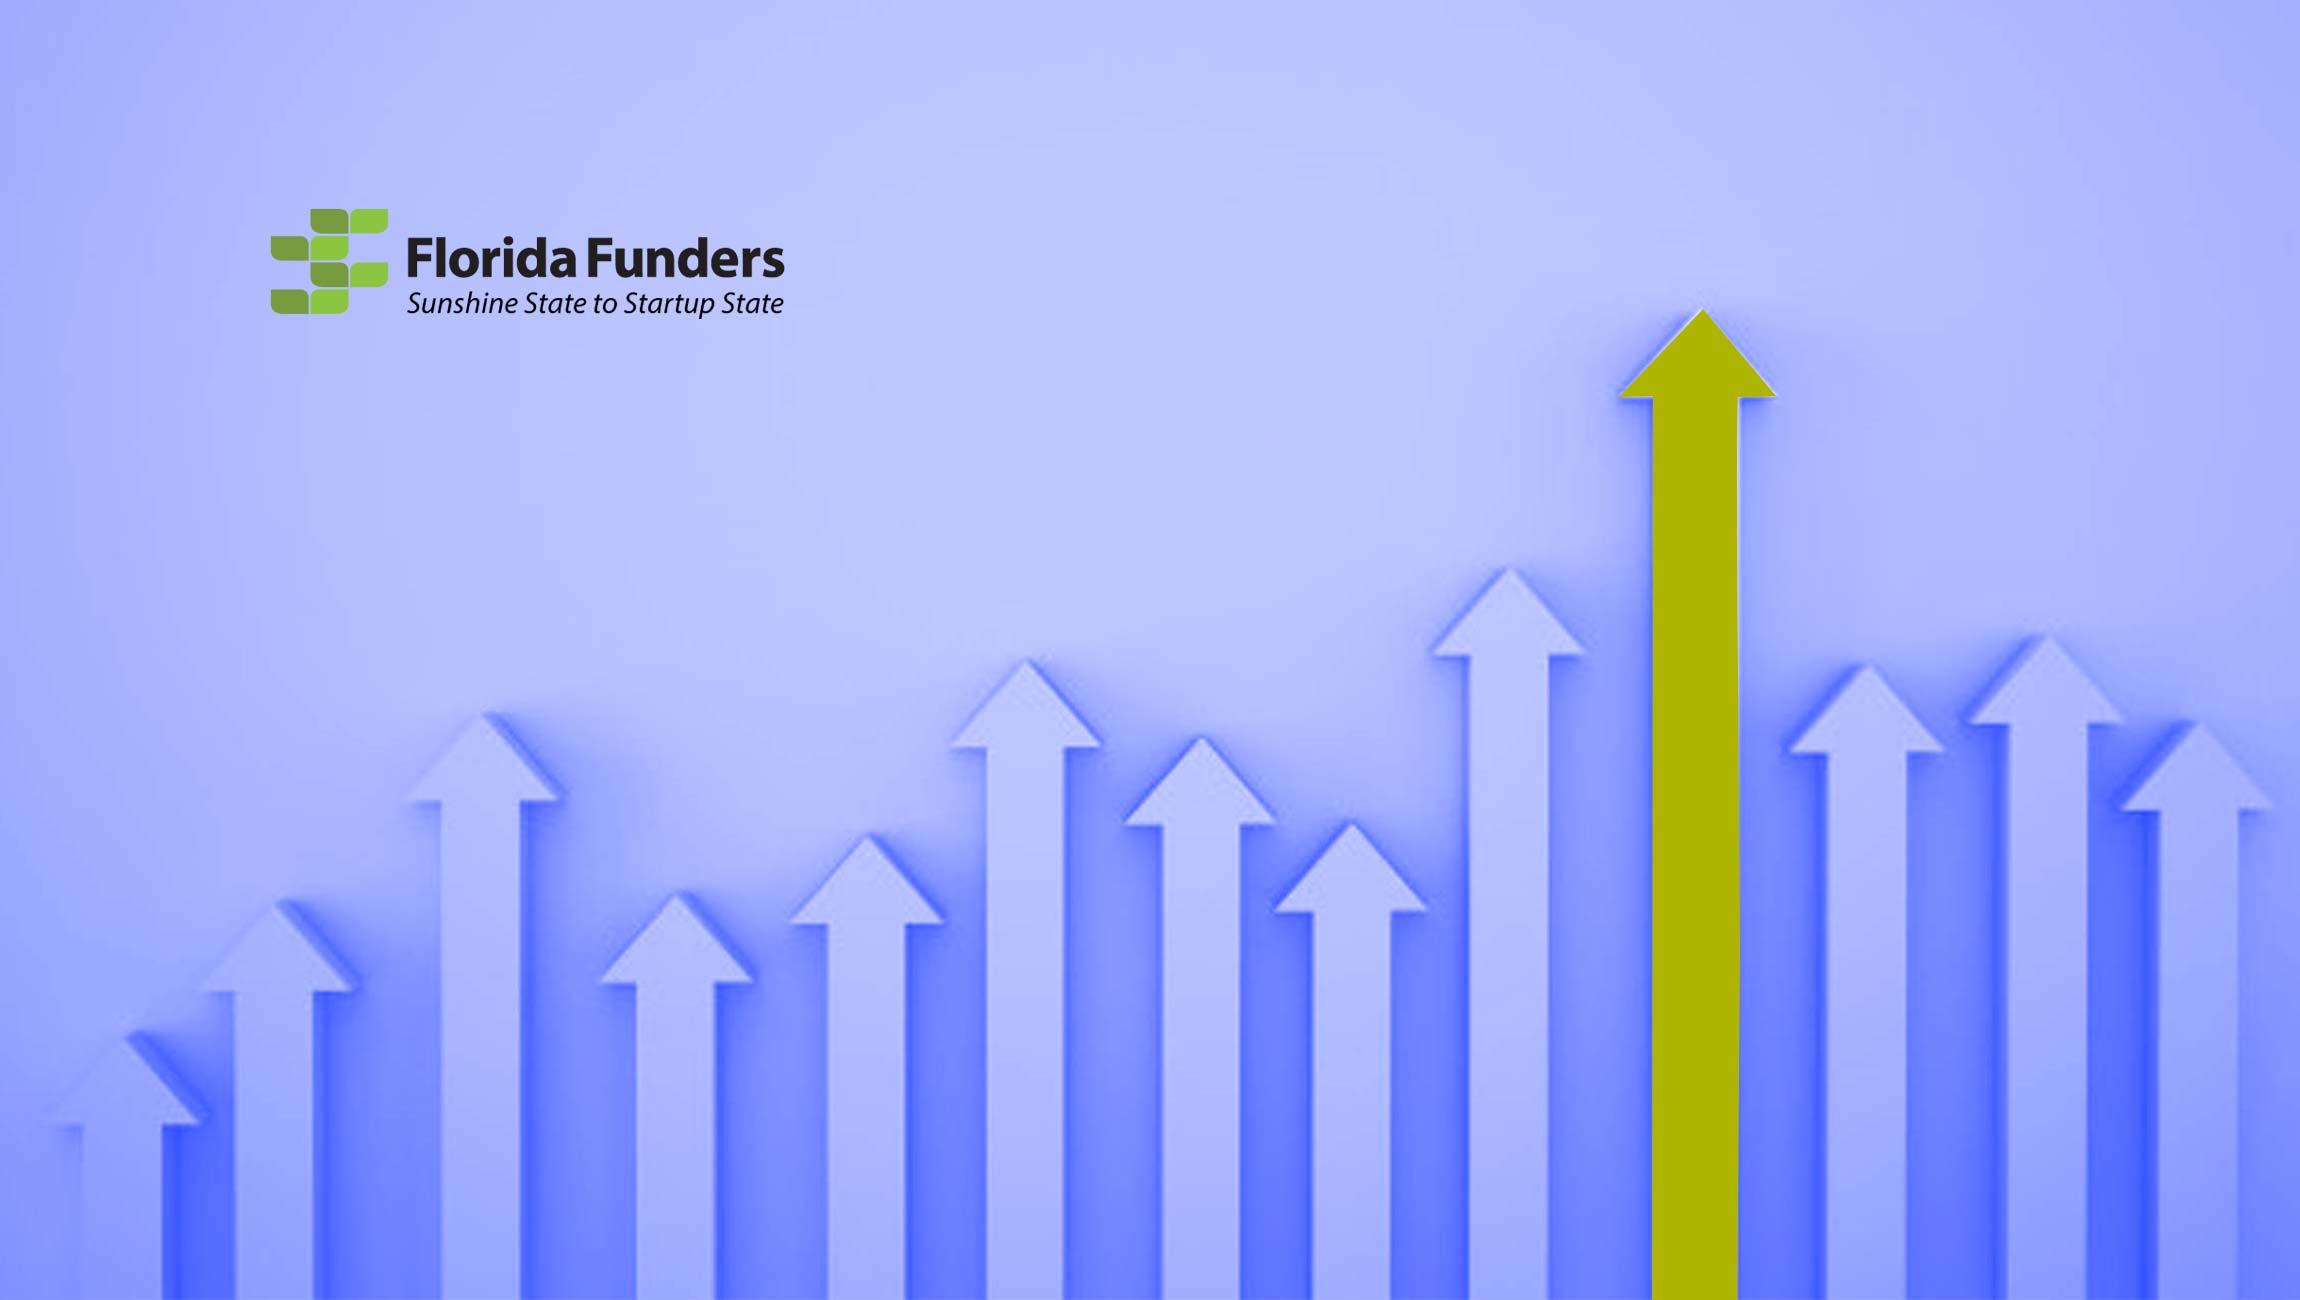 Florida Funders Invests in Kliken, a Digital Platform Designed to Simplify Online Marketing and Ignite Lead Generation 1